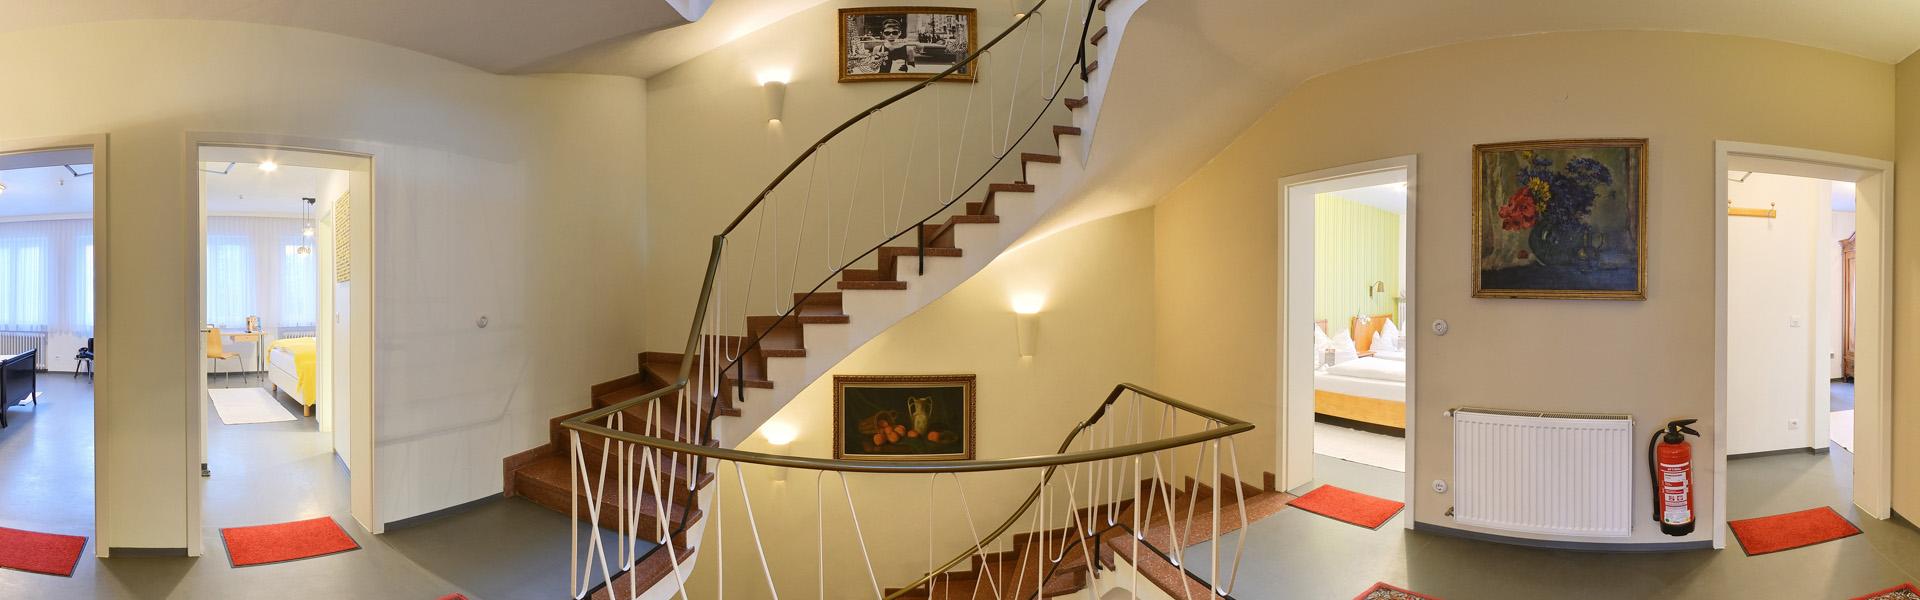 Treppenaufgang Hotel Vosteen